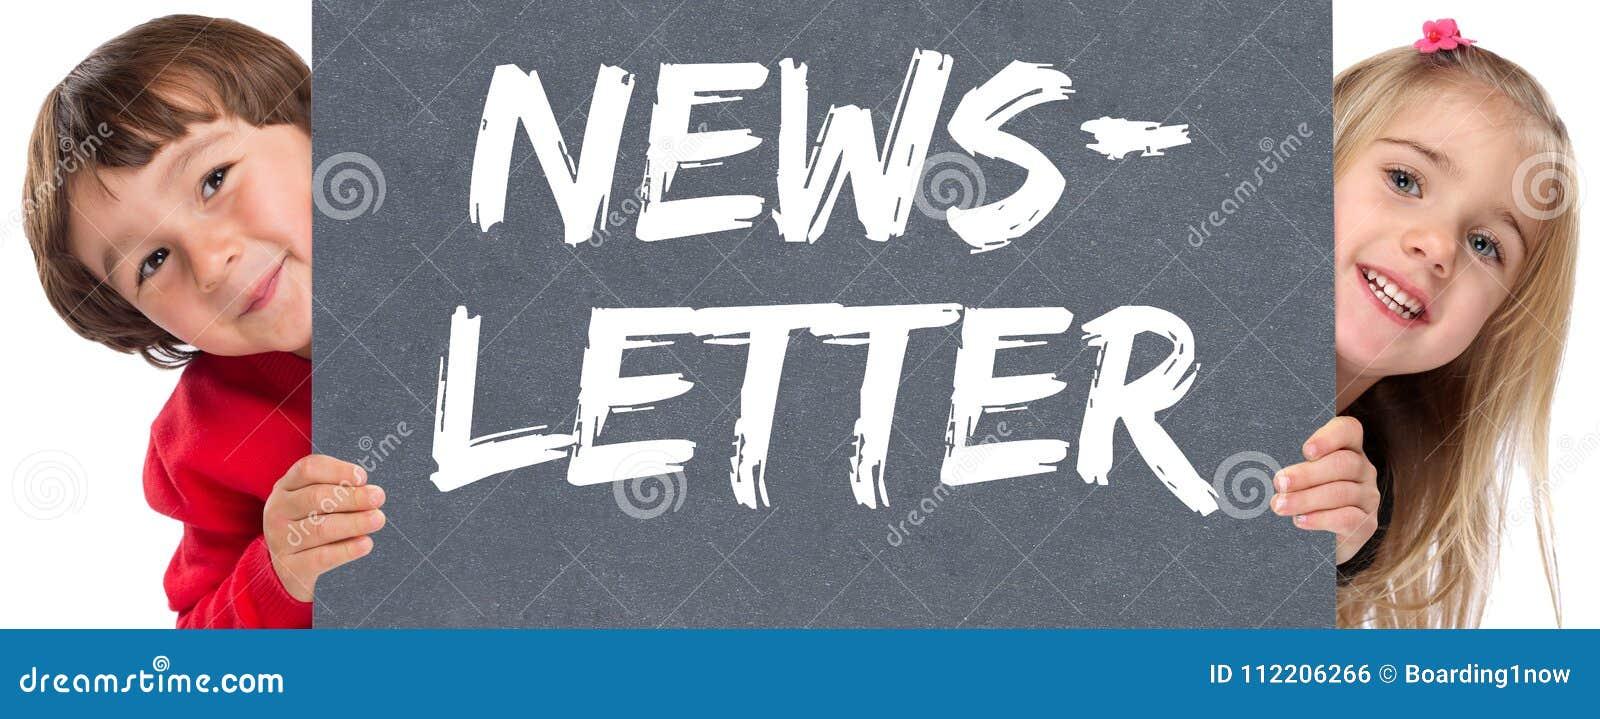 Newsletter subscribing internet marketing campaign young children kids